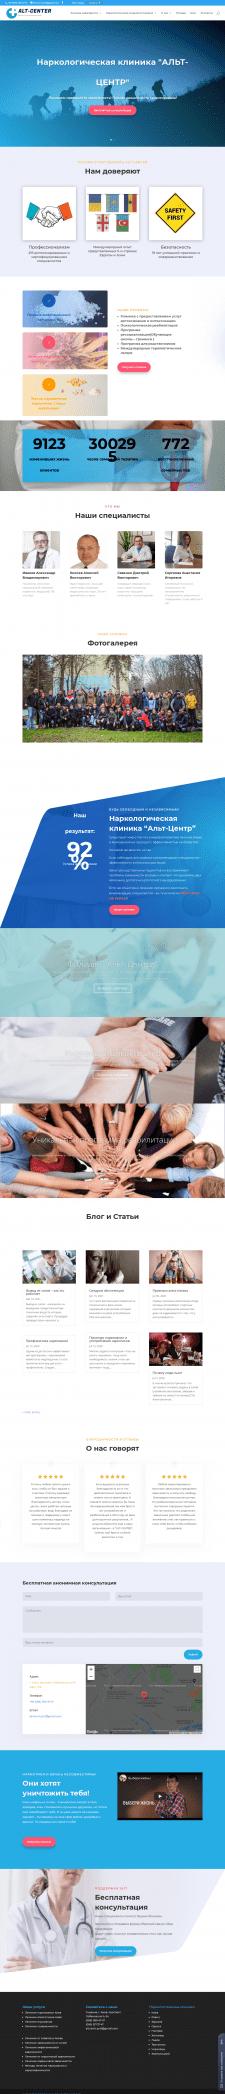 Правка сайта реабилитационной клиники на WordPress